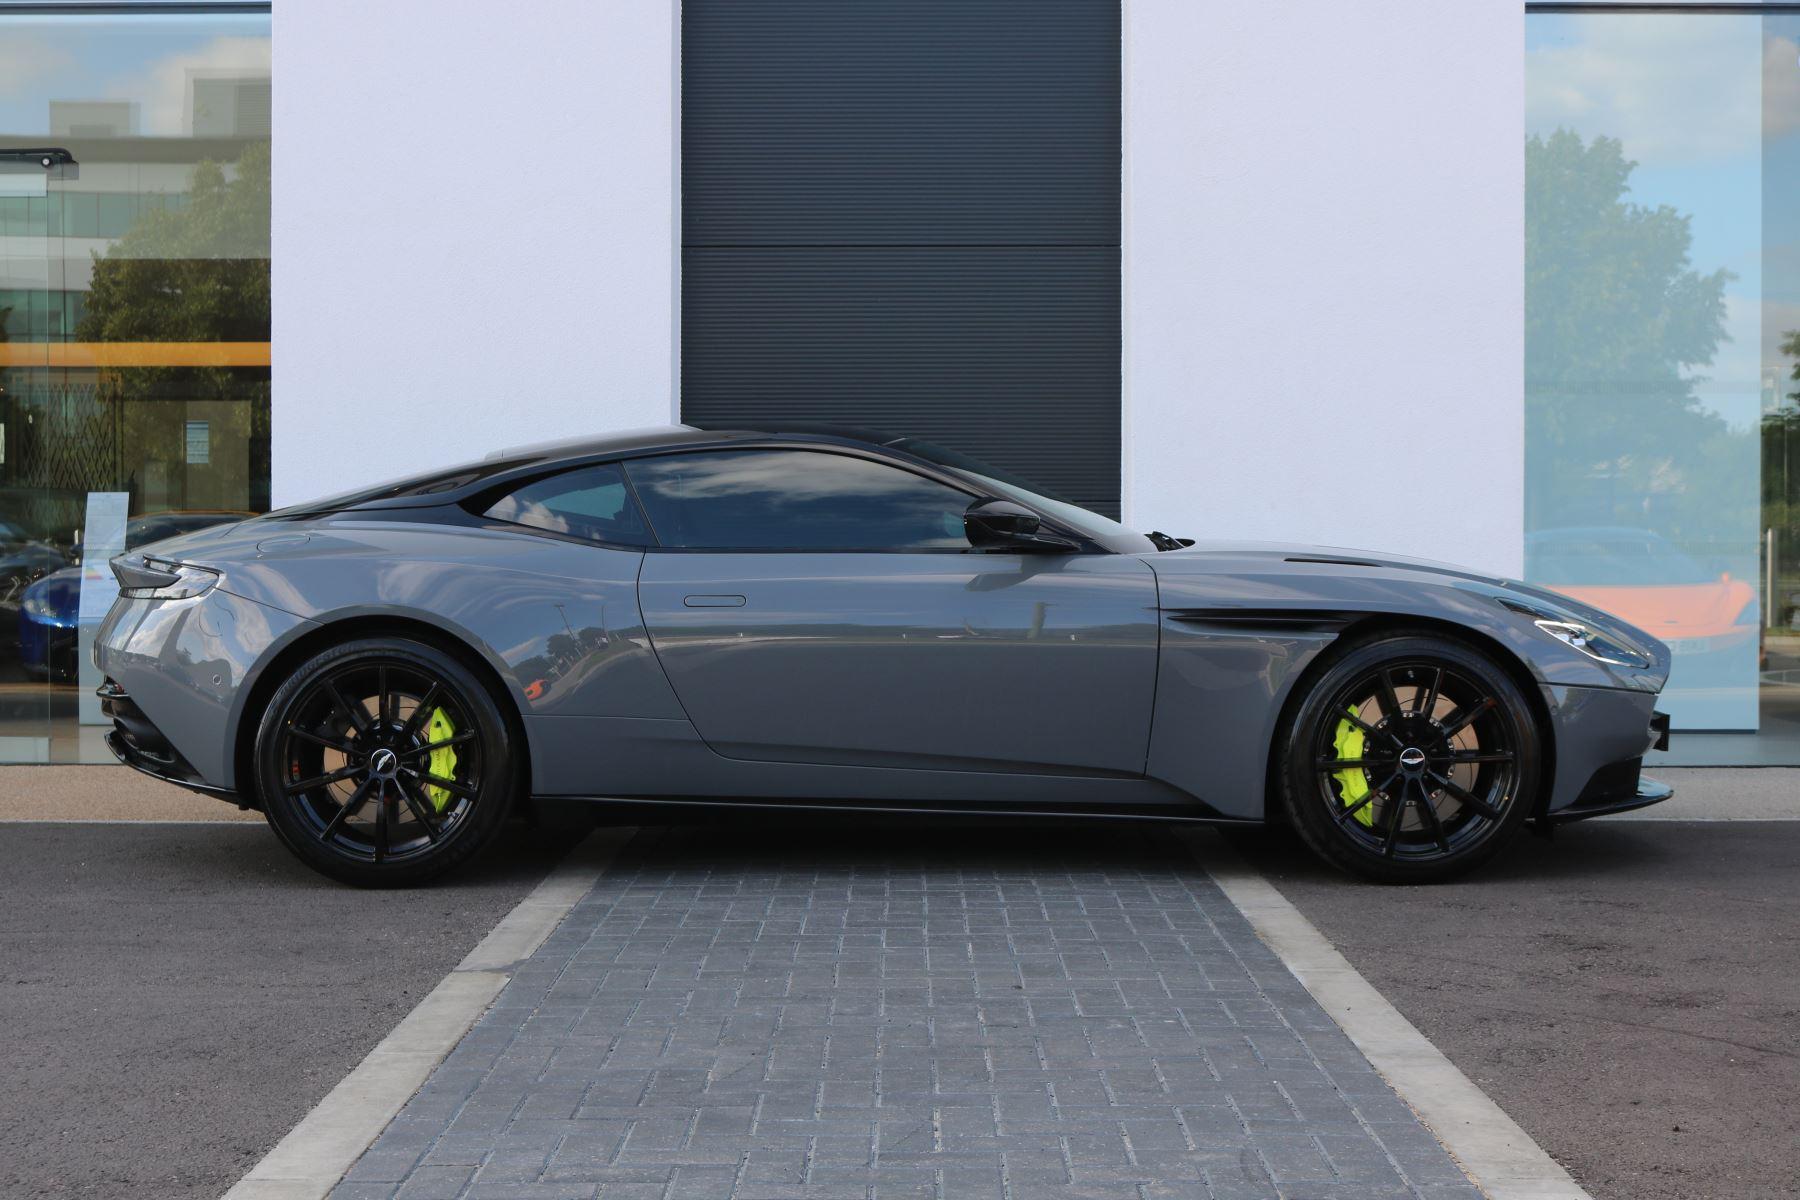 Aston Martin DB11 V12 AMR 2dr Touchtronic image 4